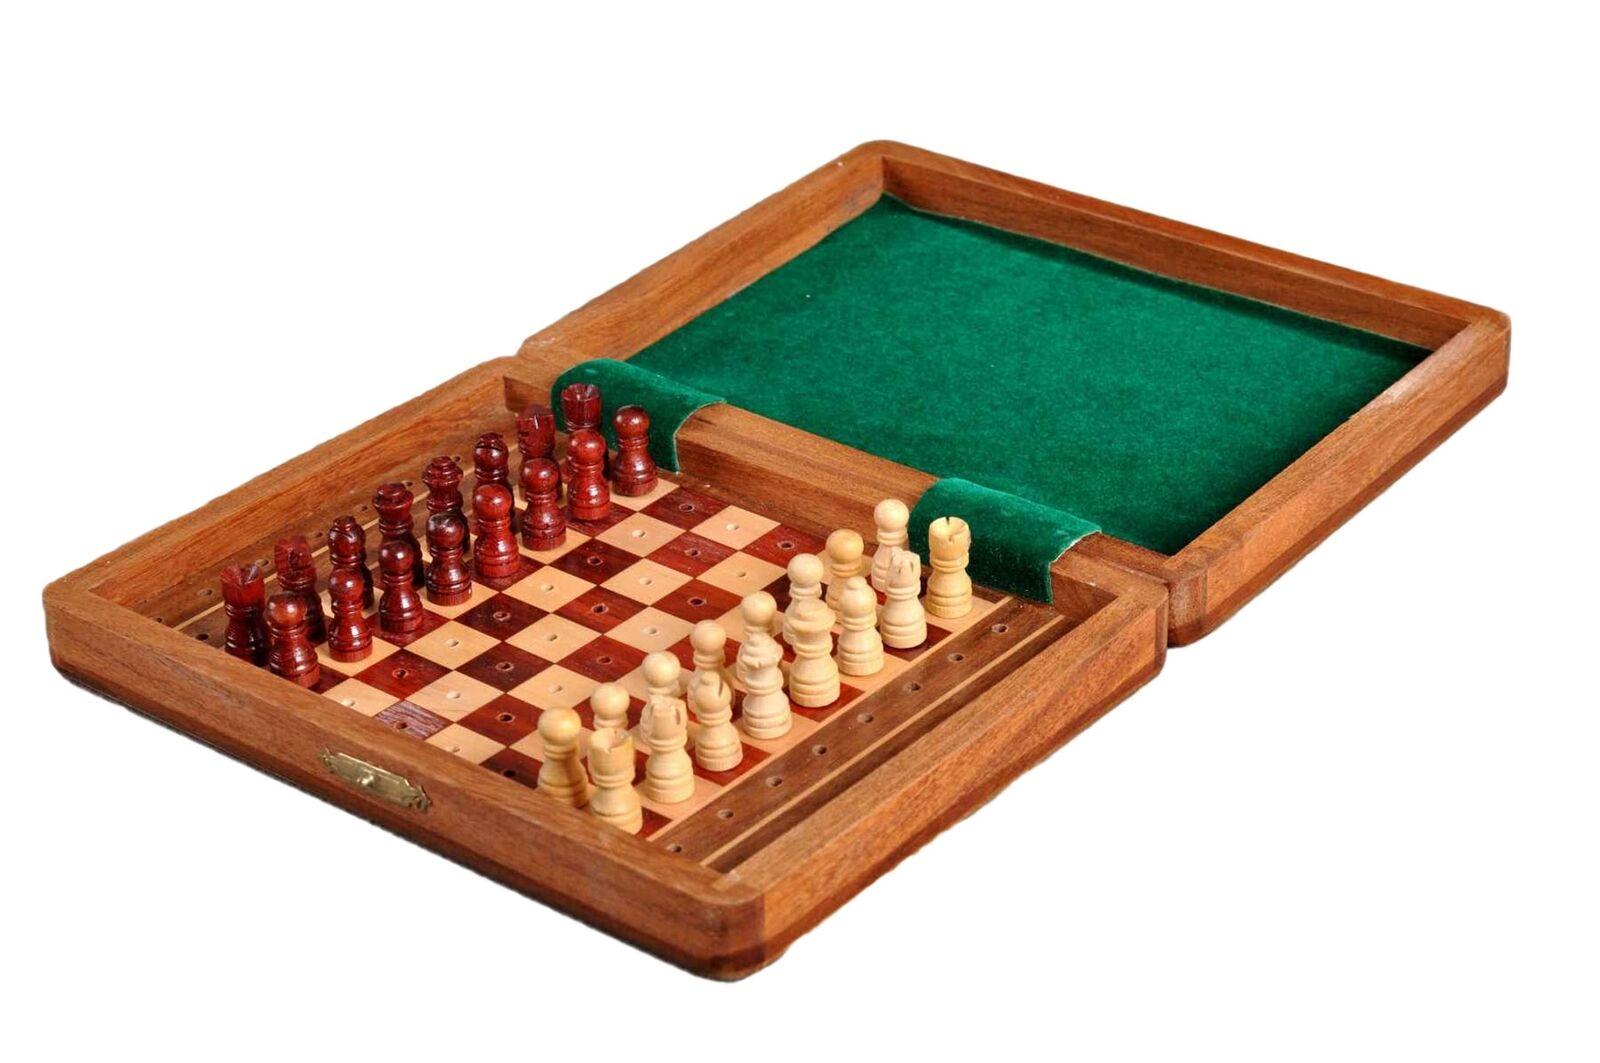 PEG WOODEN Travel Chess Set -  8  x 6   godendo i tuoi acquisti